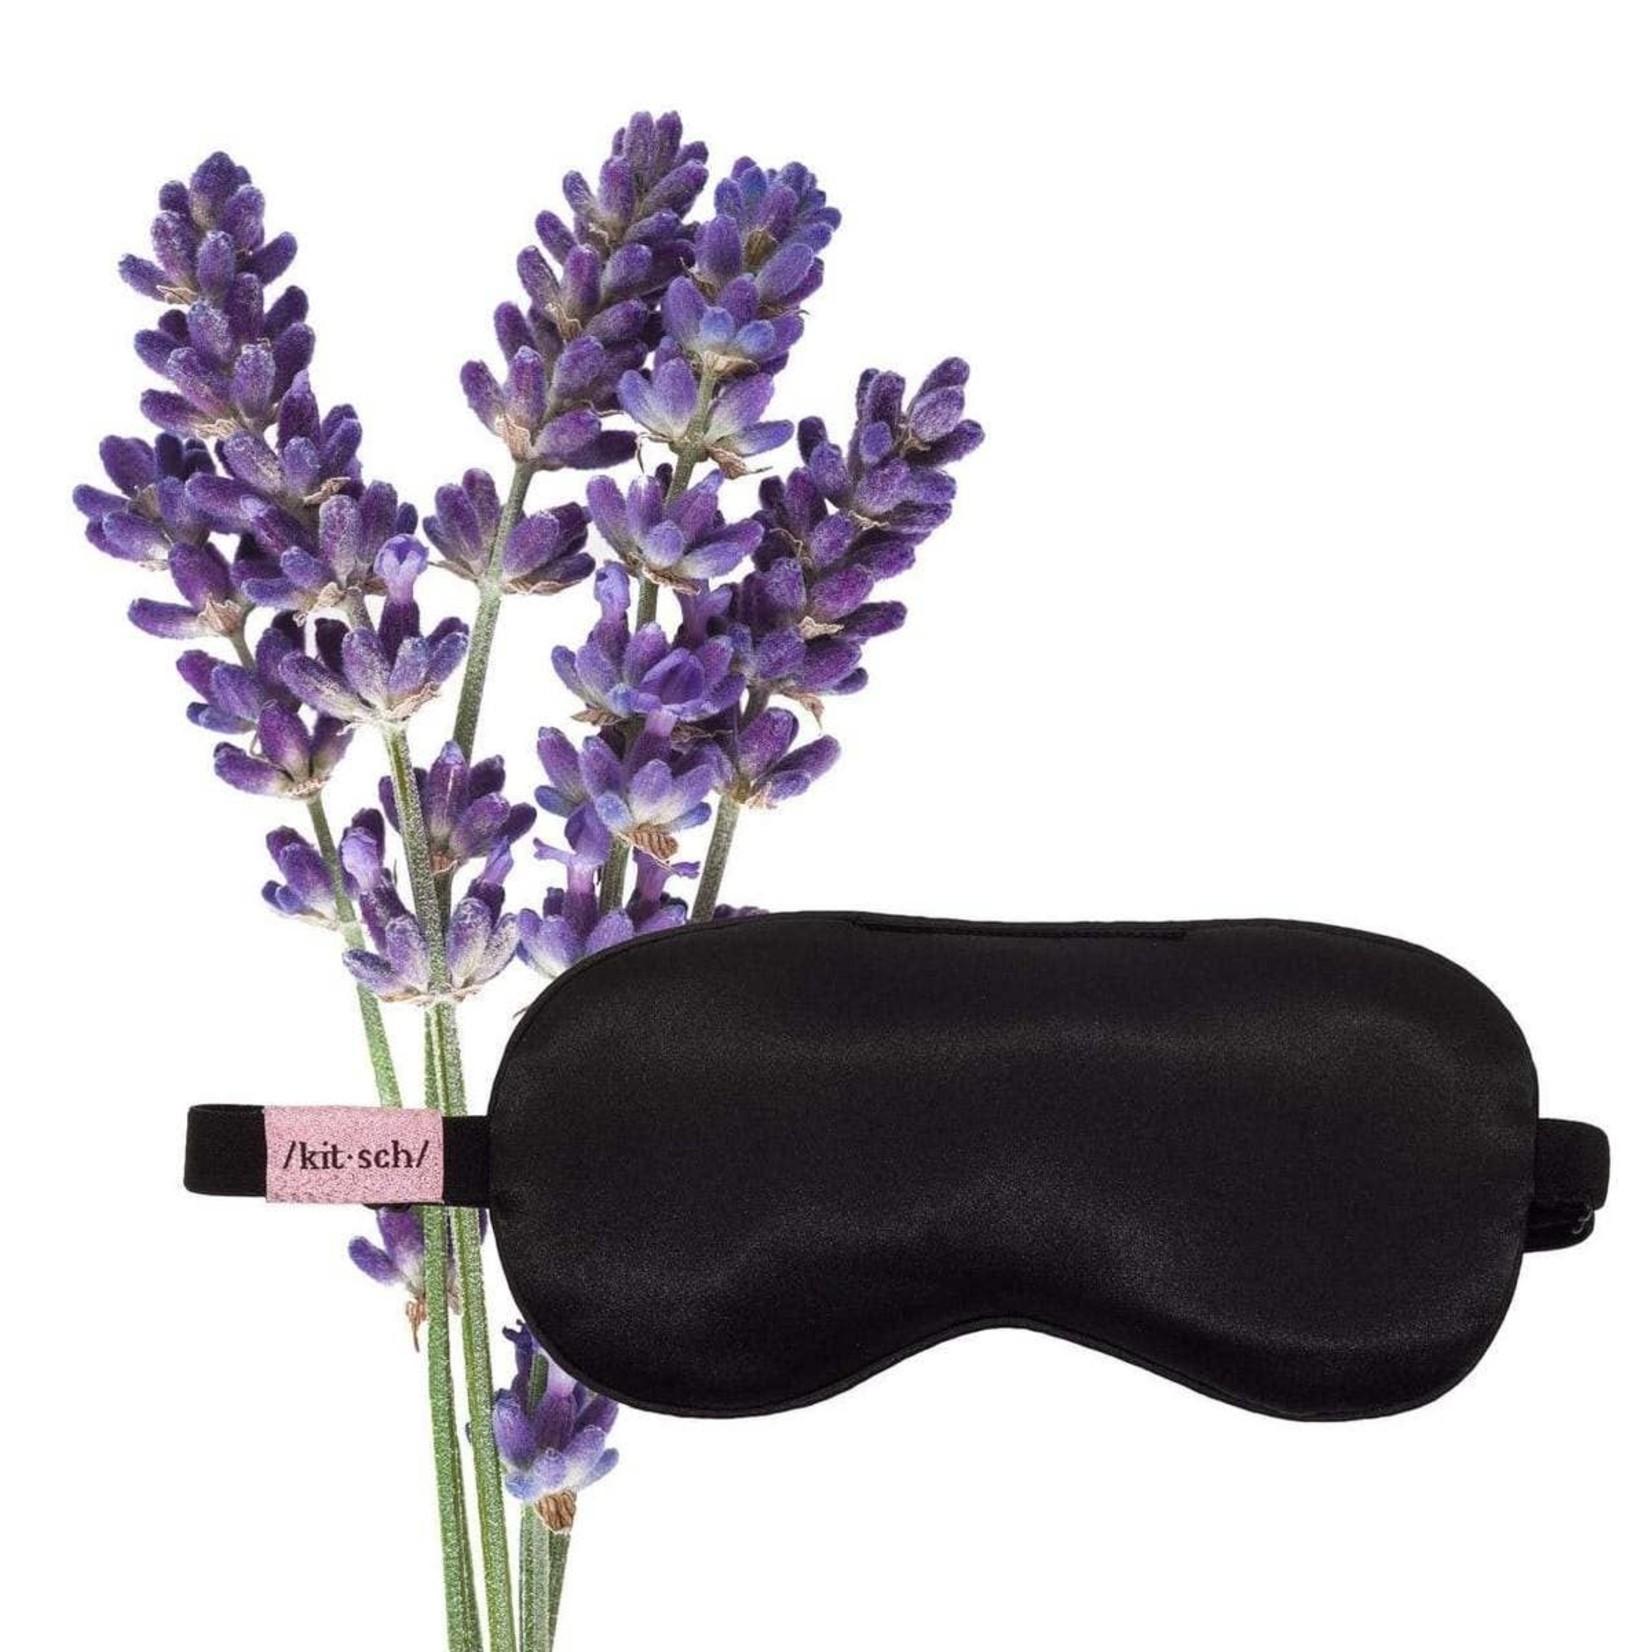 Kitsch Satin Weighted Eye Mask in Lavender Scent